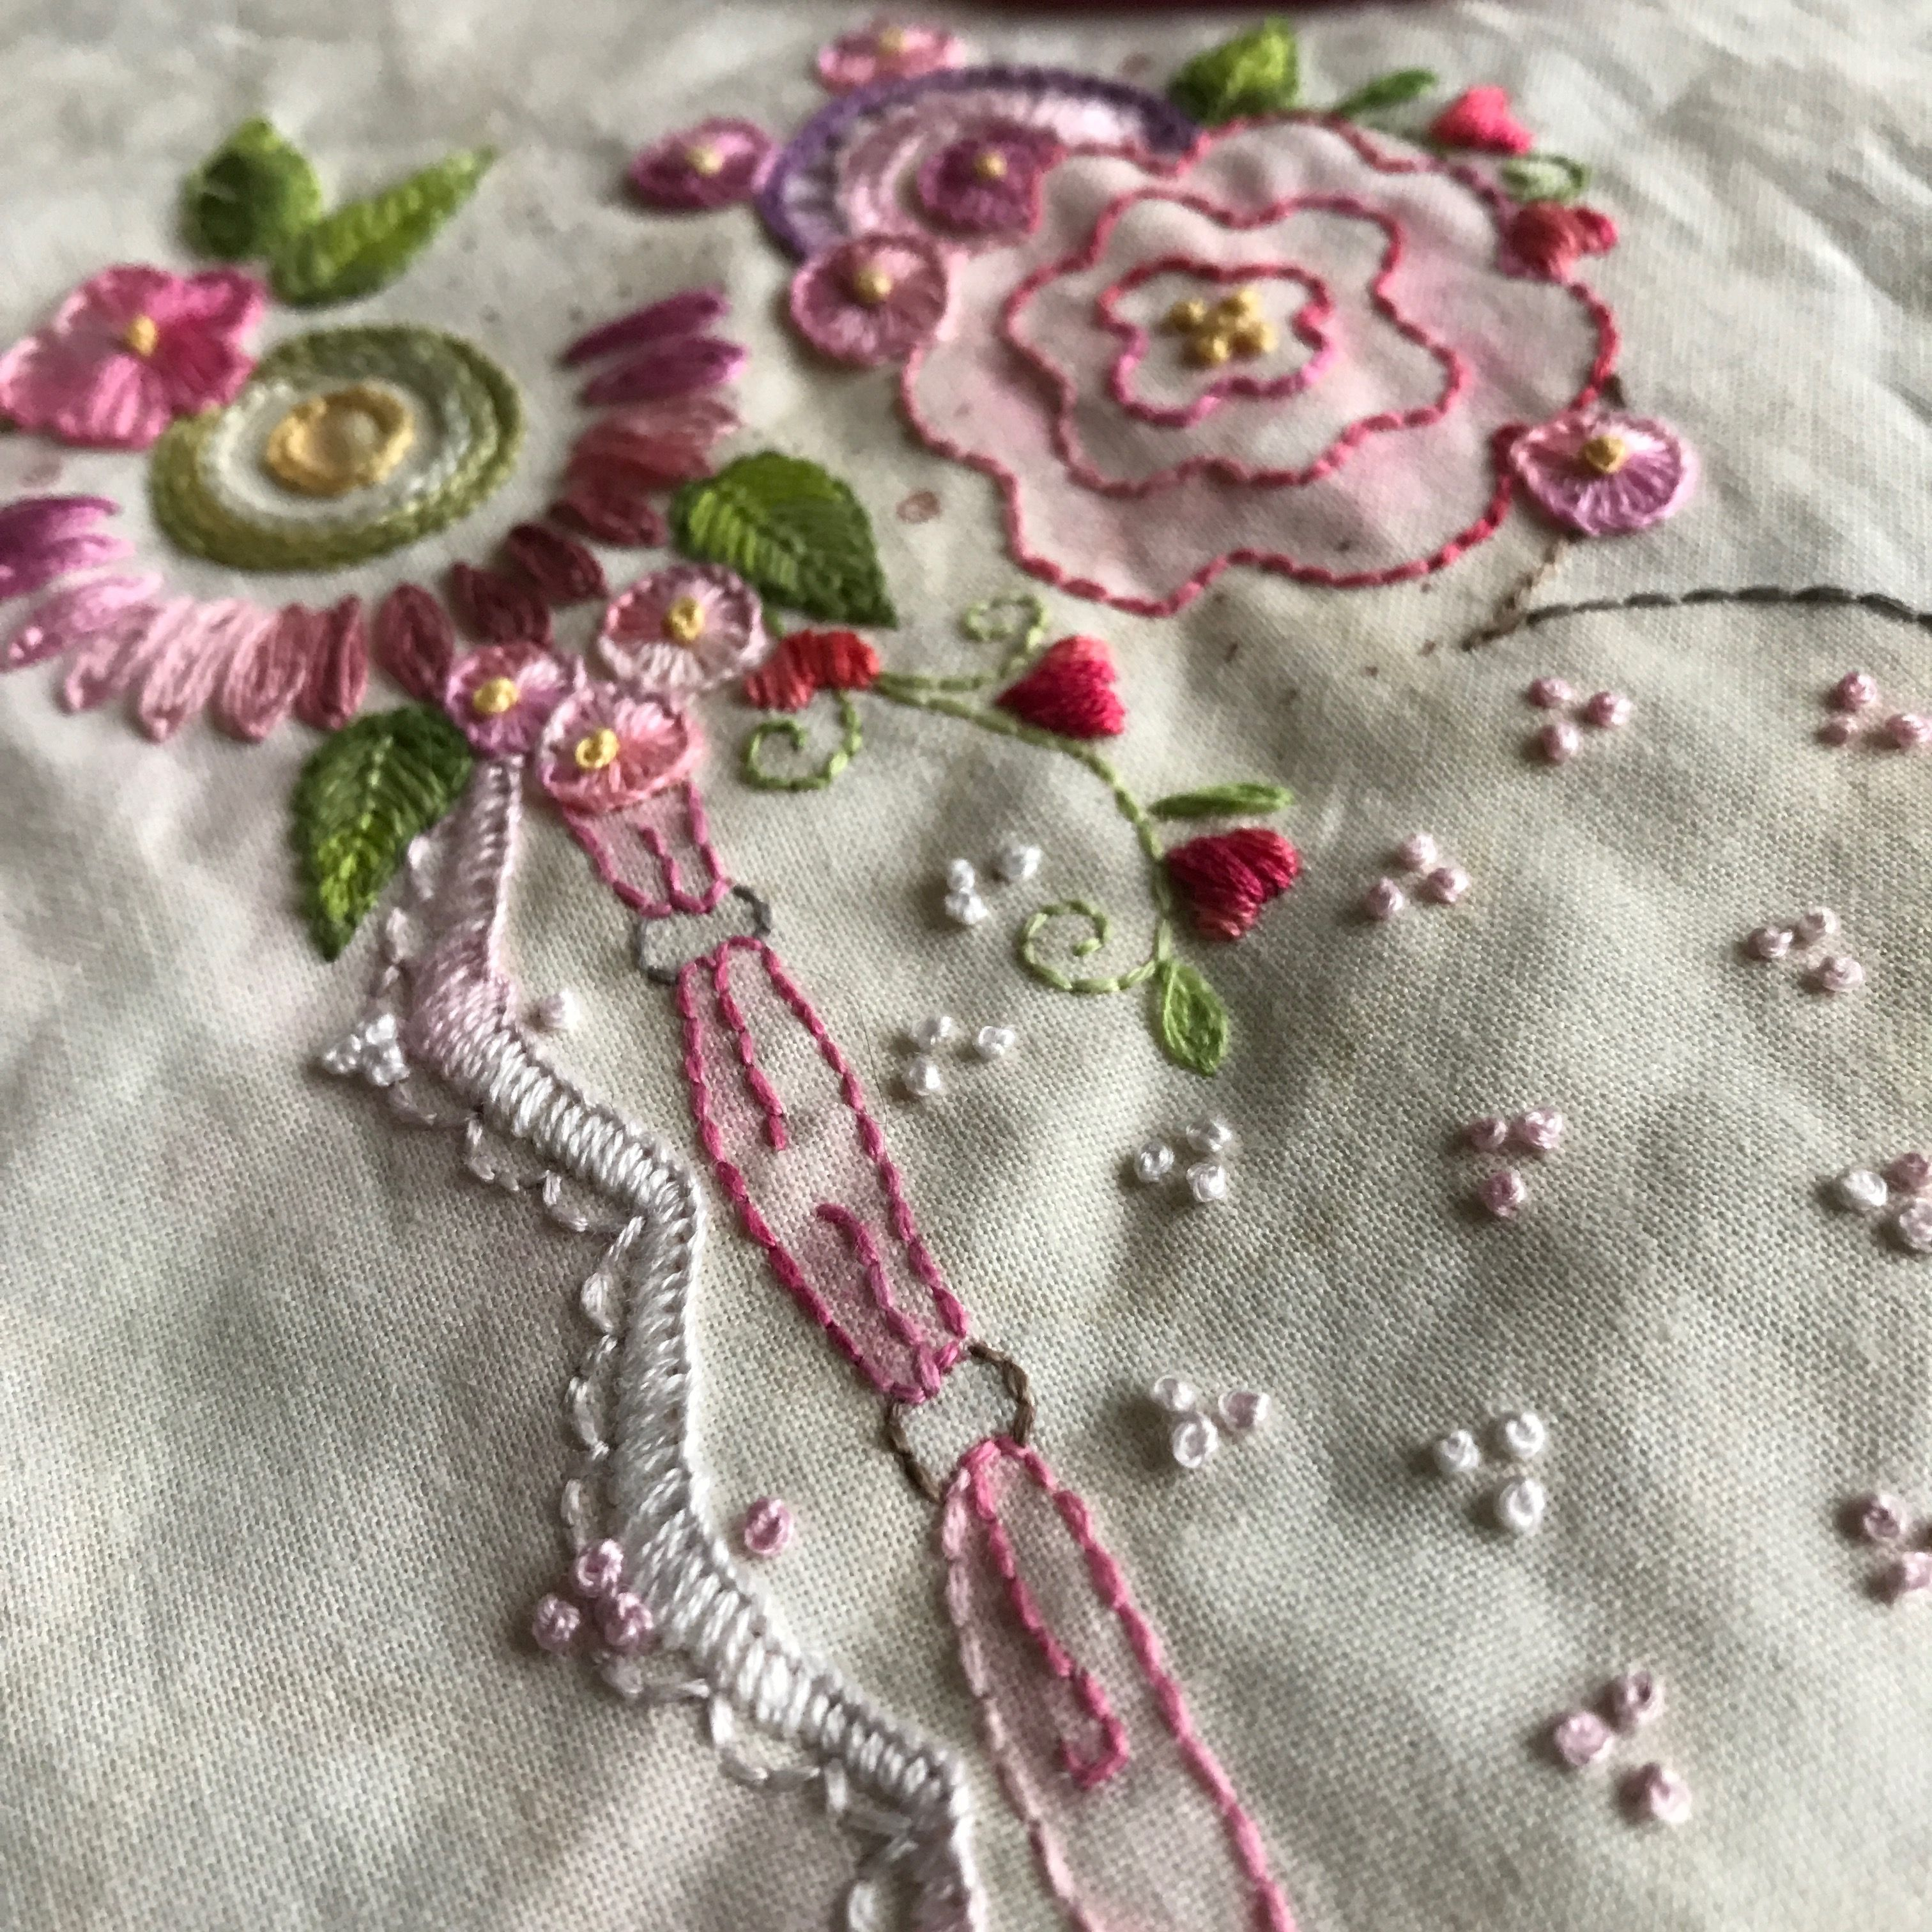 Crabapple hill studio meg hawkey embroidery passion